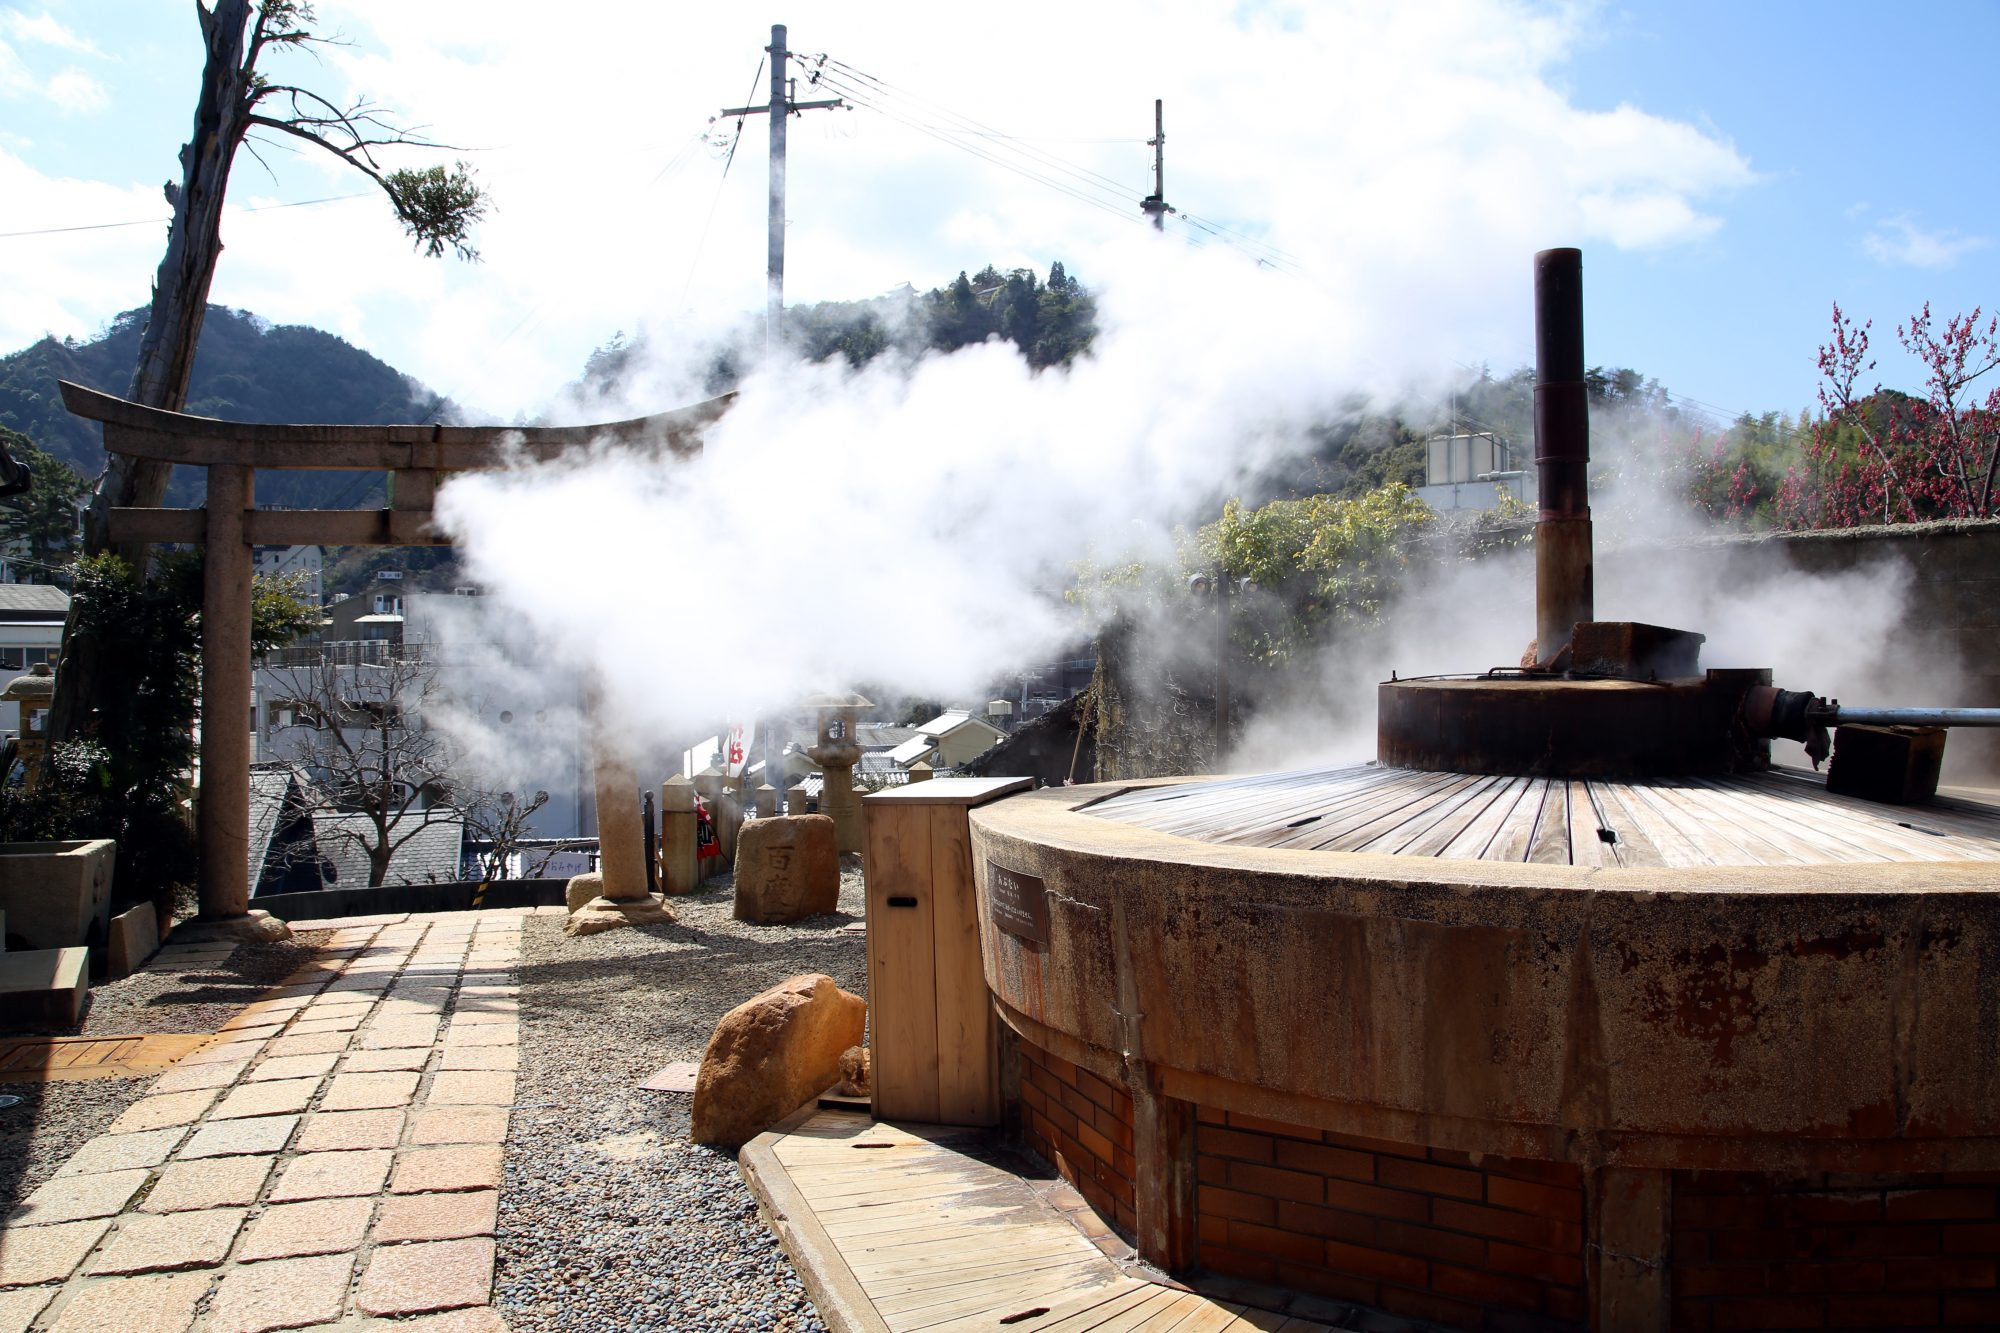 tenjin-spring-source-at-Arima-onsen-e1509082998126